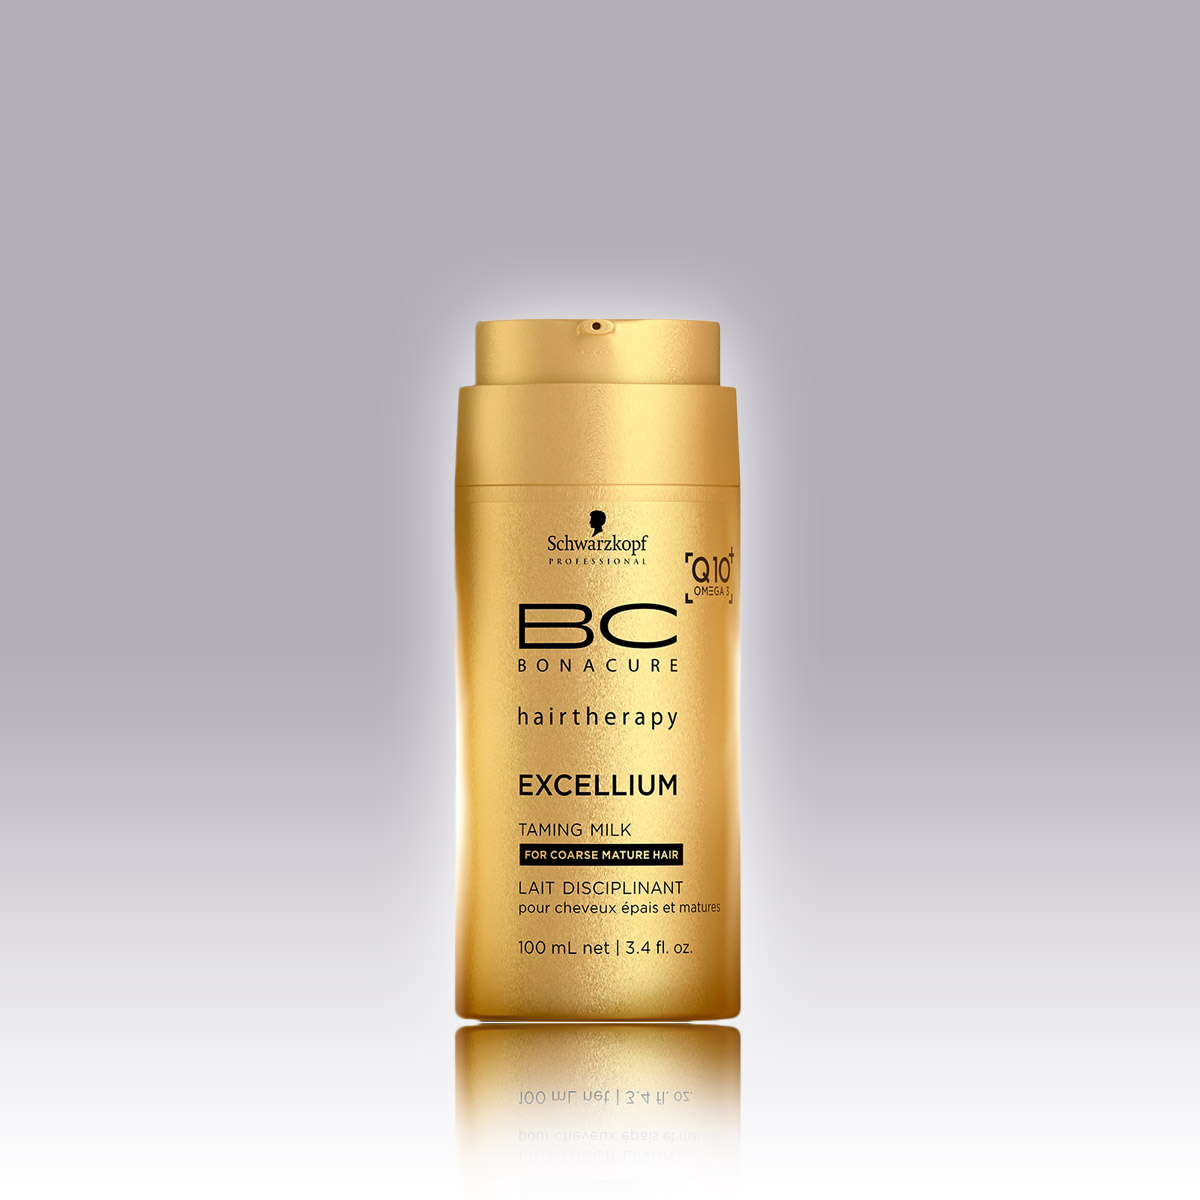 BC EXCELLIUM Q10 + Omega 3 Mléko pro zkrocení vlasů, 100 ml, 399 Kč